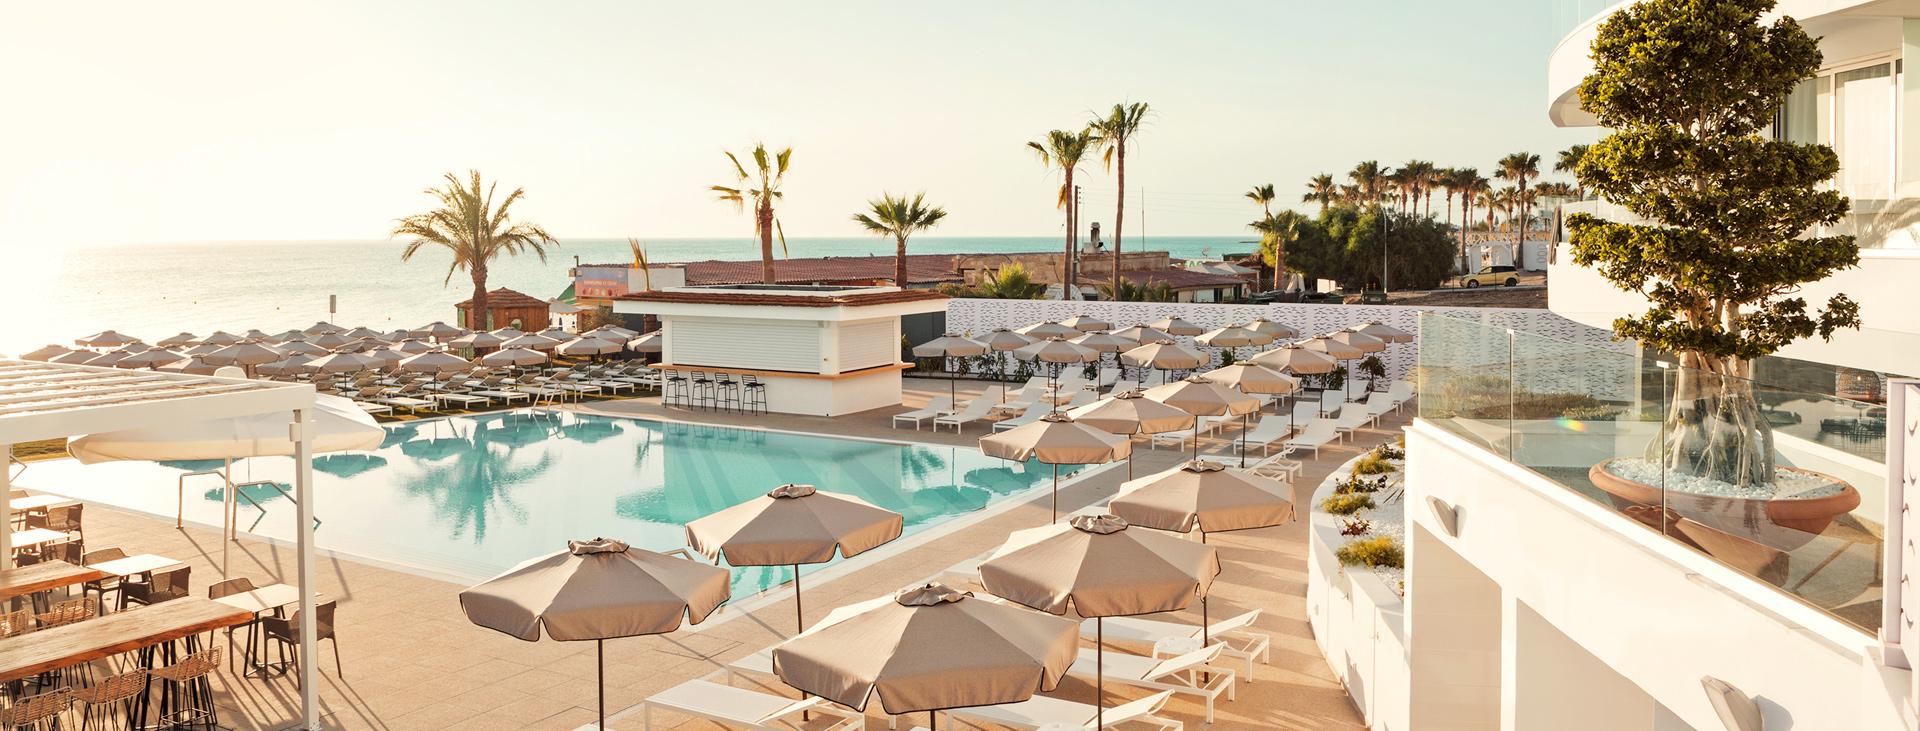 Sunprime Protaras Beach, Protaras/Fig Tree Bay, Cypern, Cypern